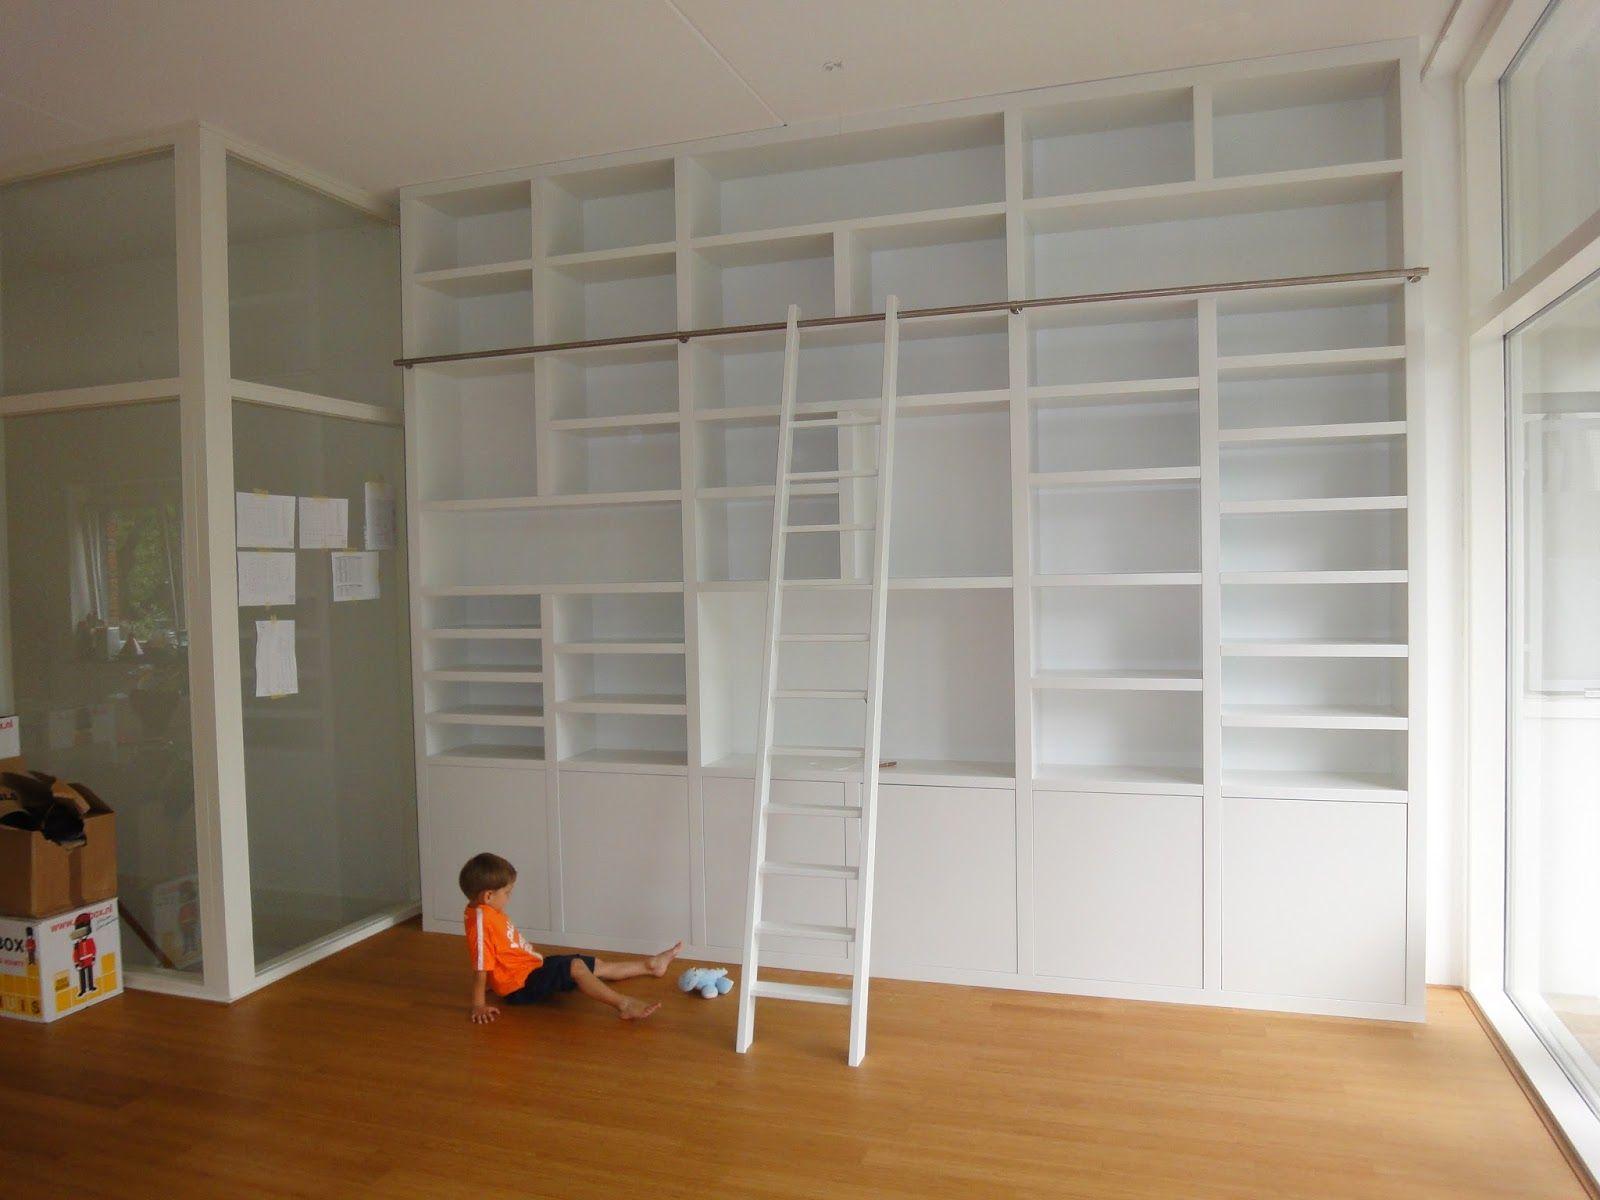 Mooie plafond hoge wandkast op maat gemaakt - Woonkamer | Pinterest ...